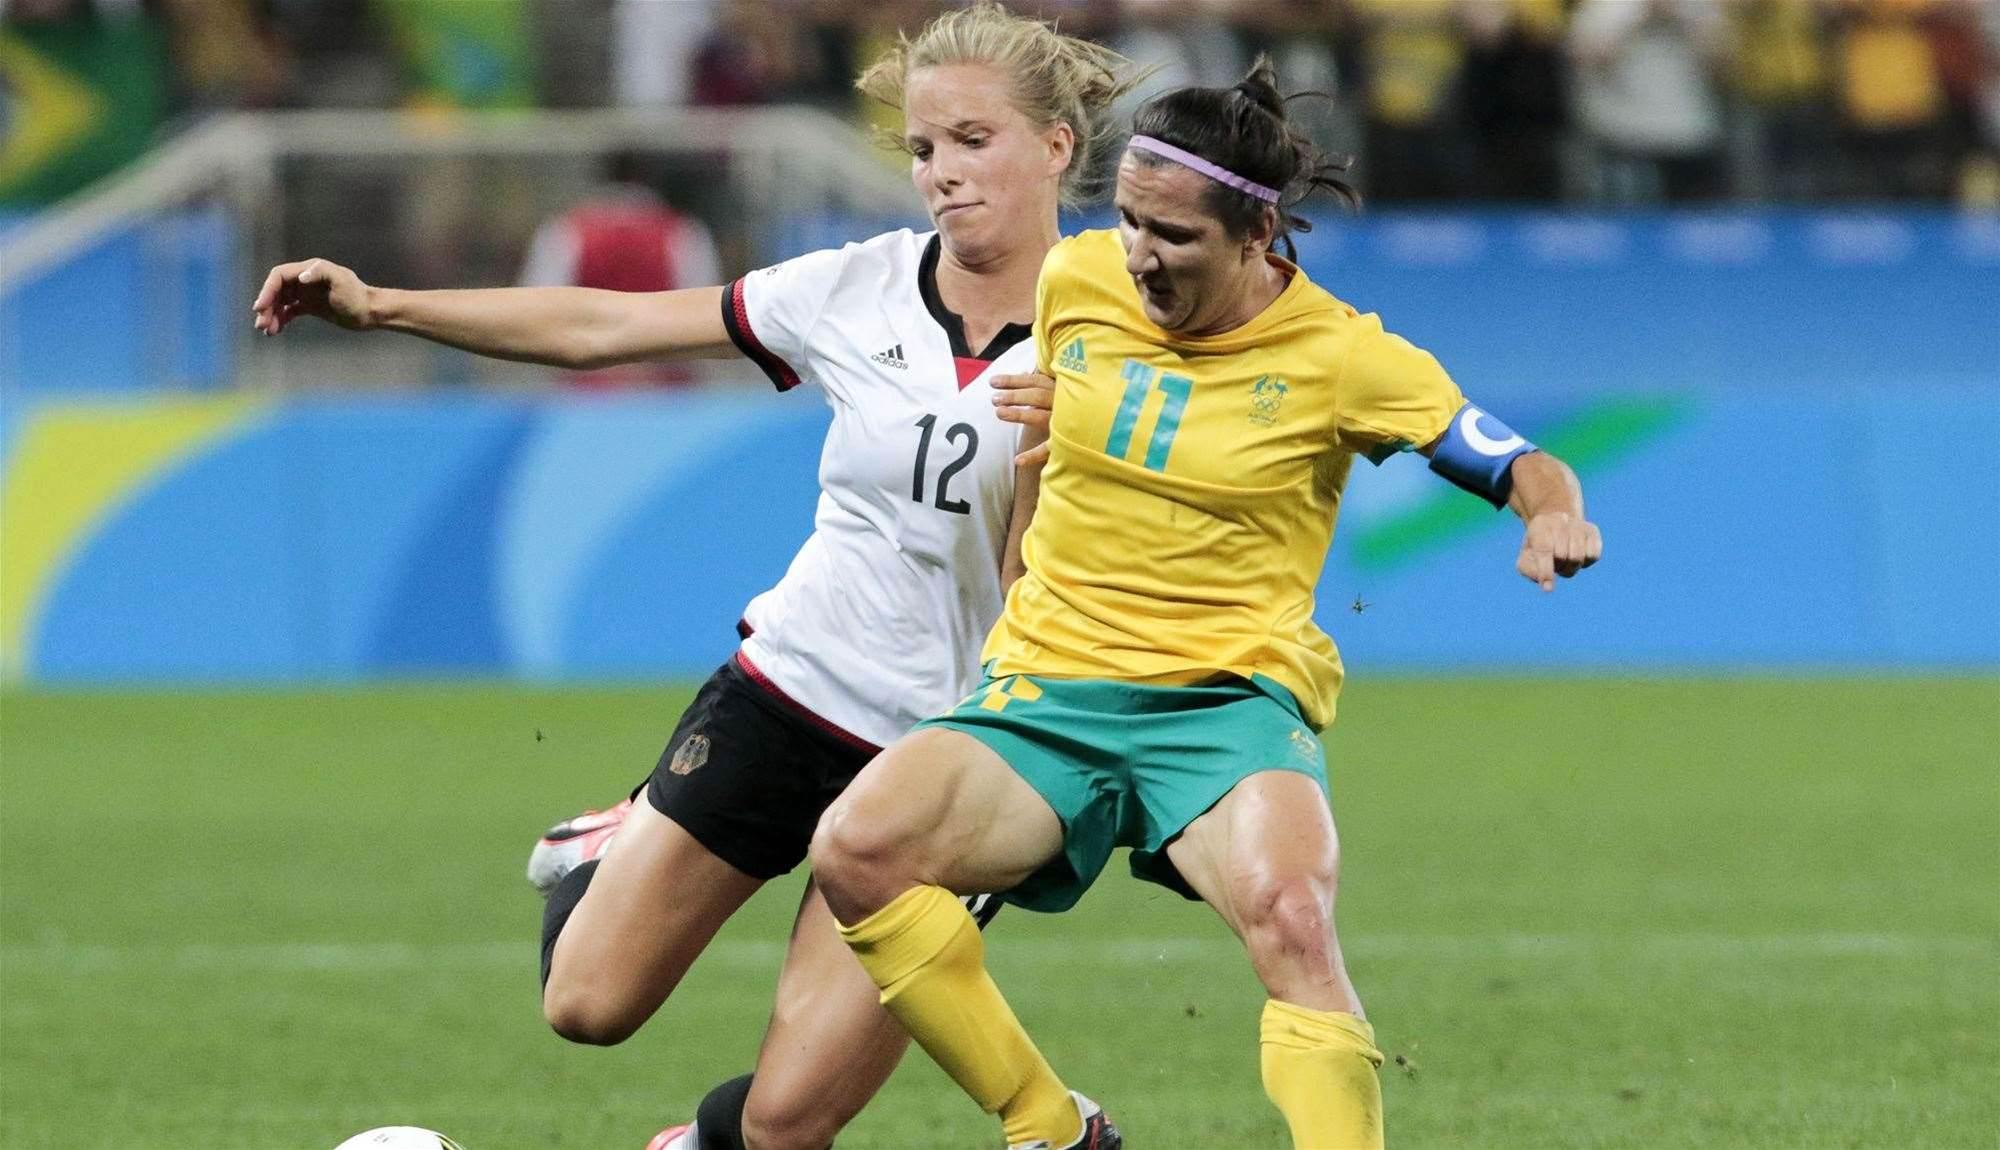 Matildas denied by late equaliser